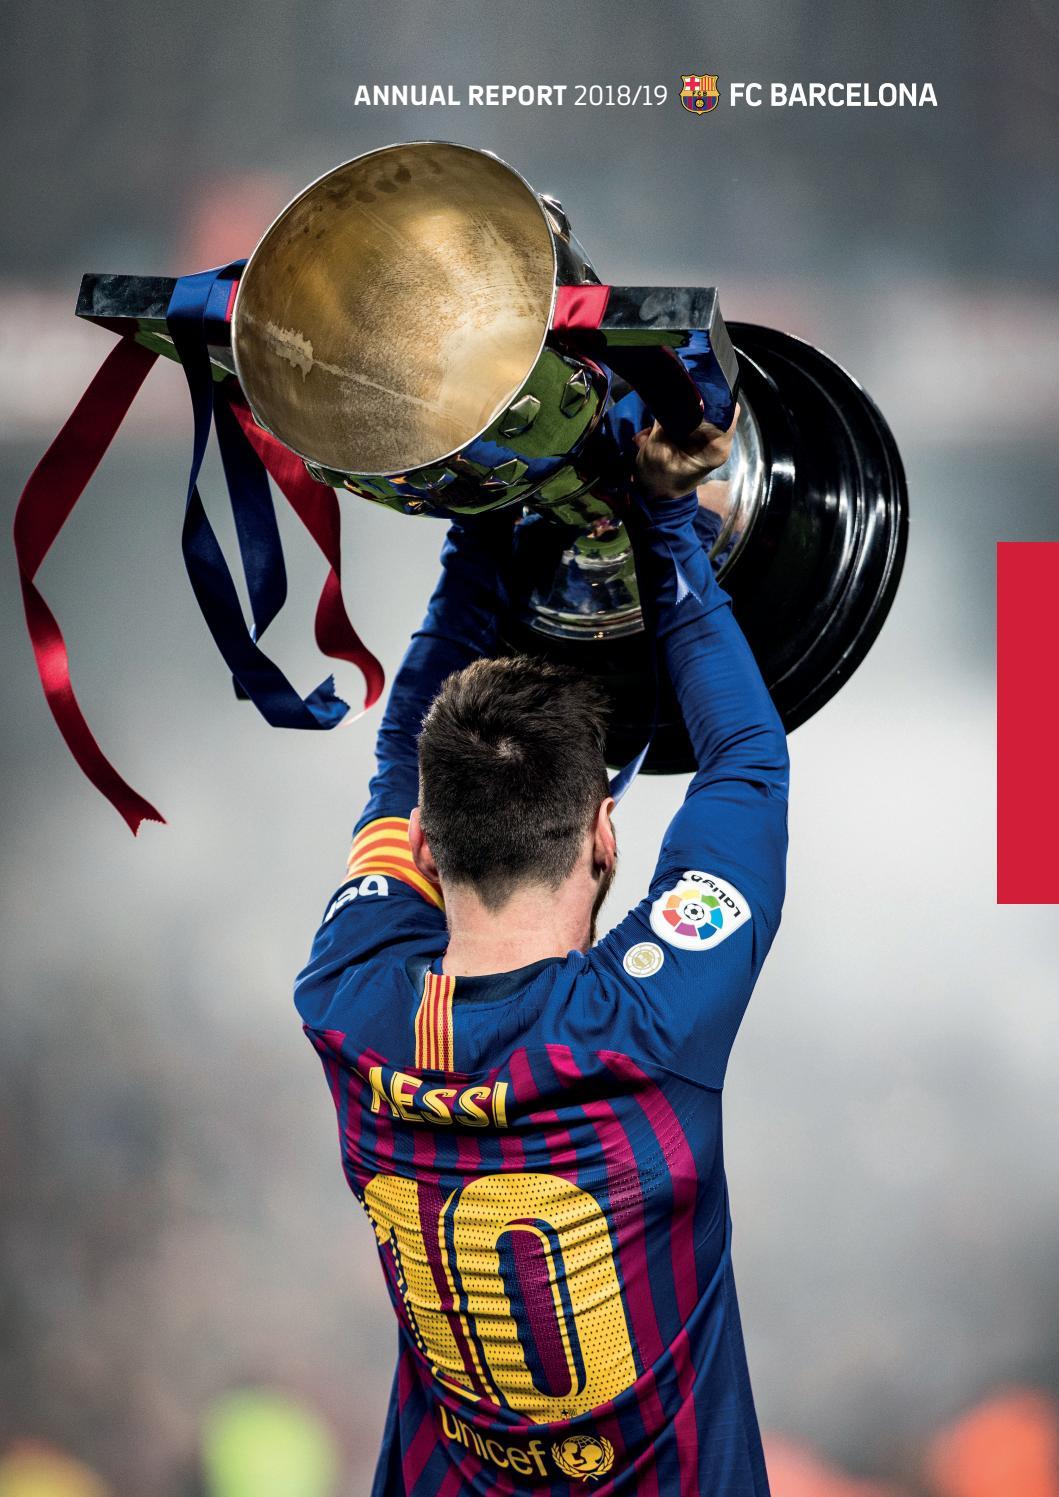 Fc Barcelona Annual Report 2018 19 By Fc Barcelona Issuu